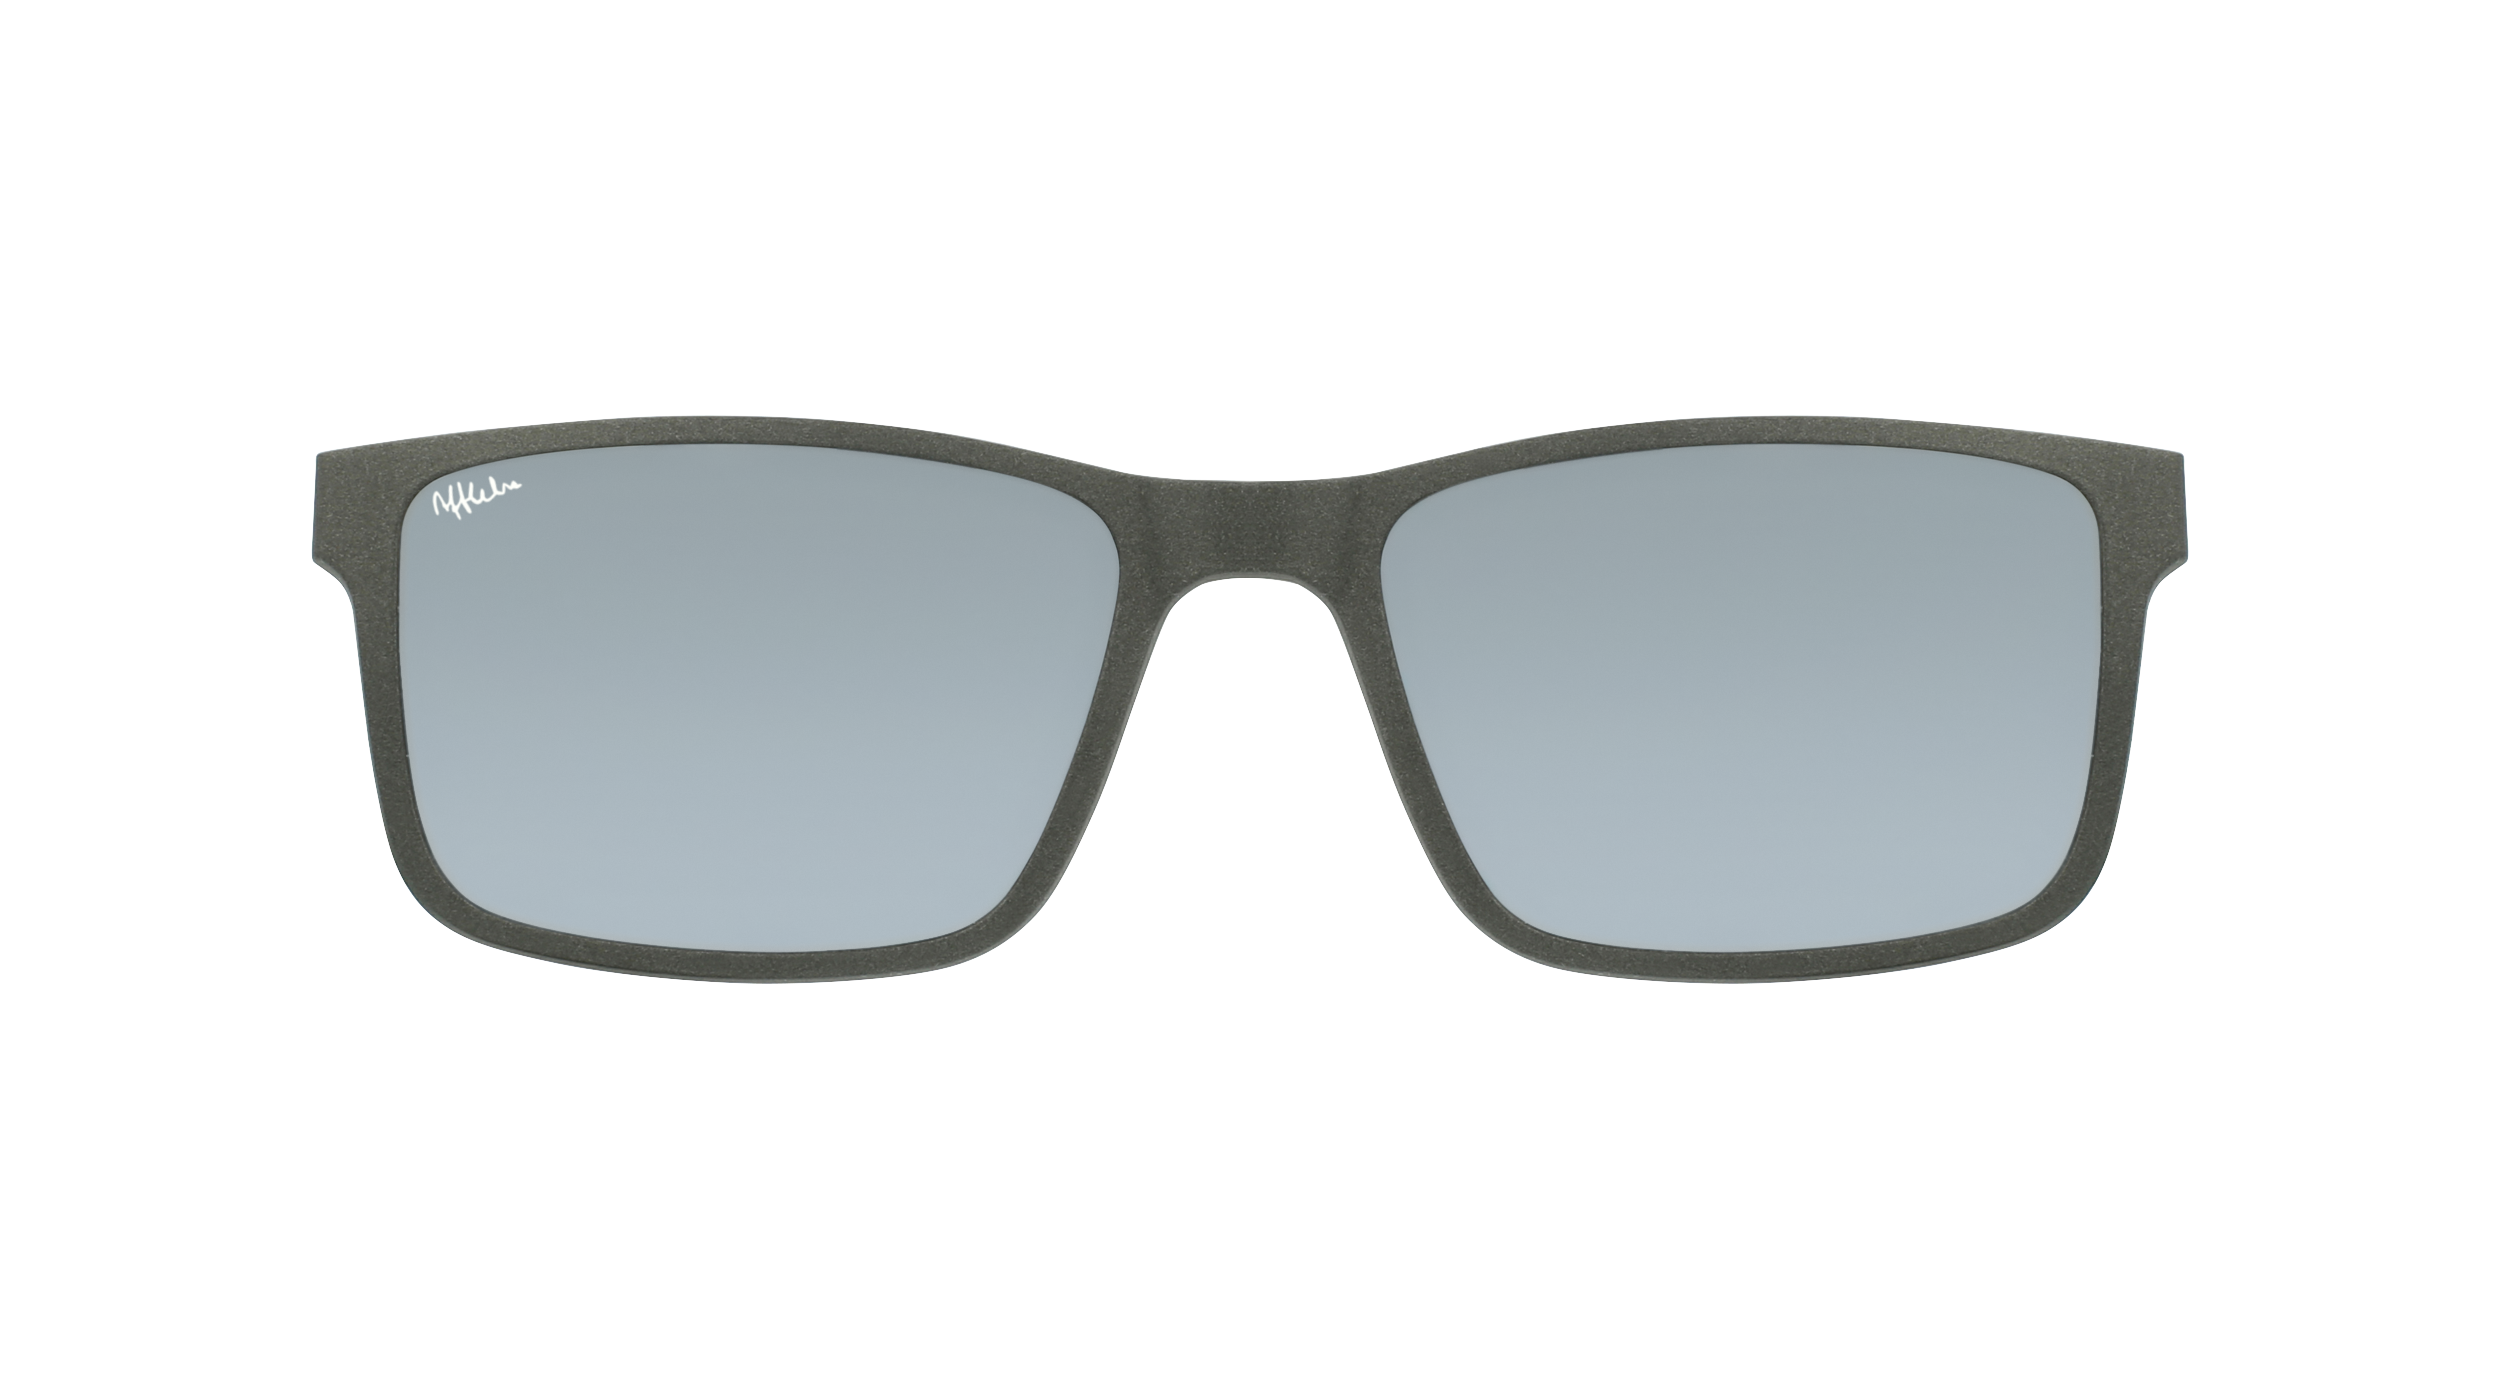 afflelou/france/products/smart_clip/clips_glasses/07630036457504.png